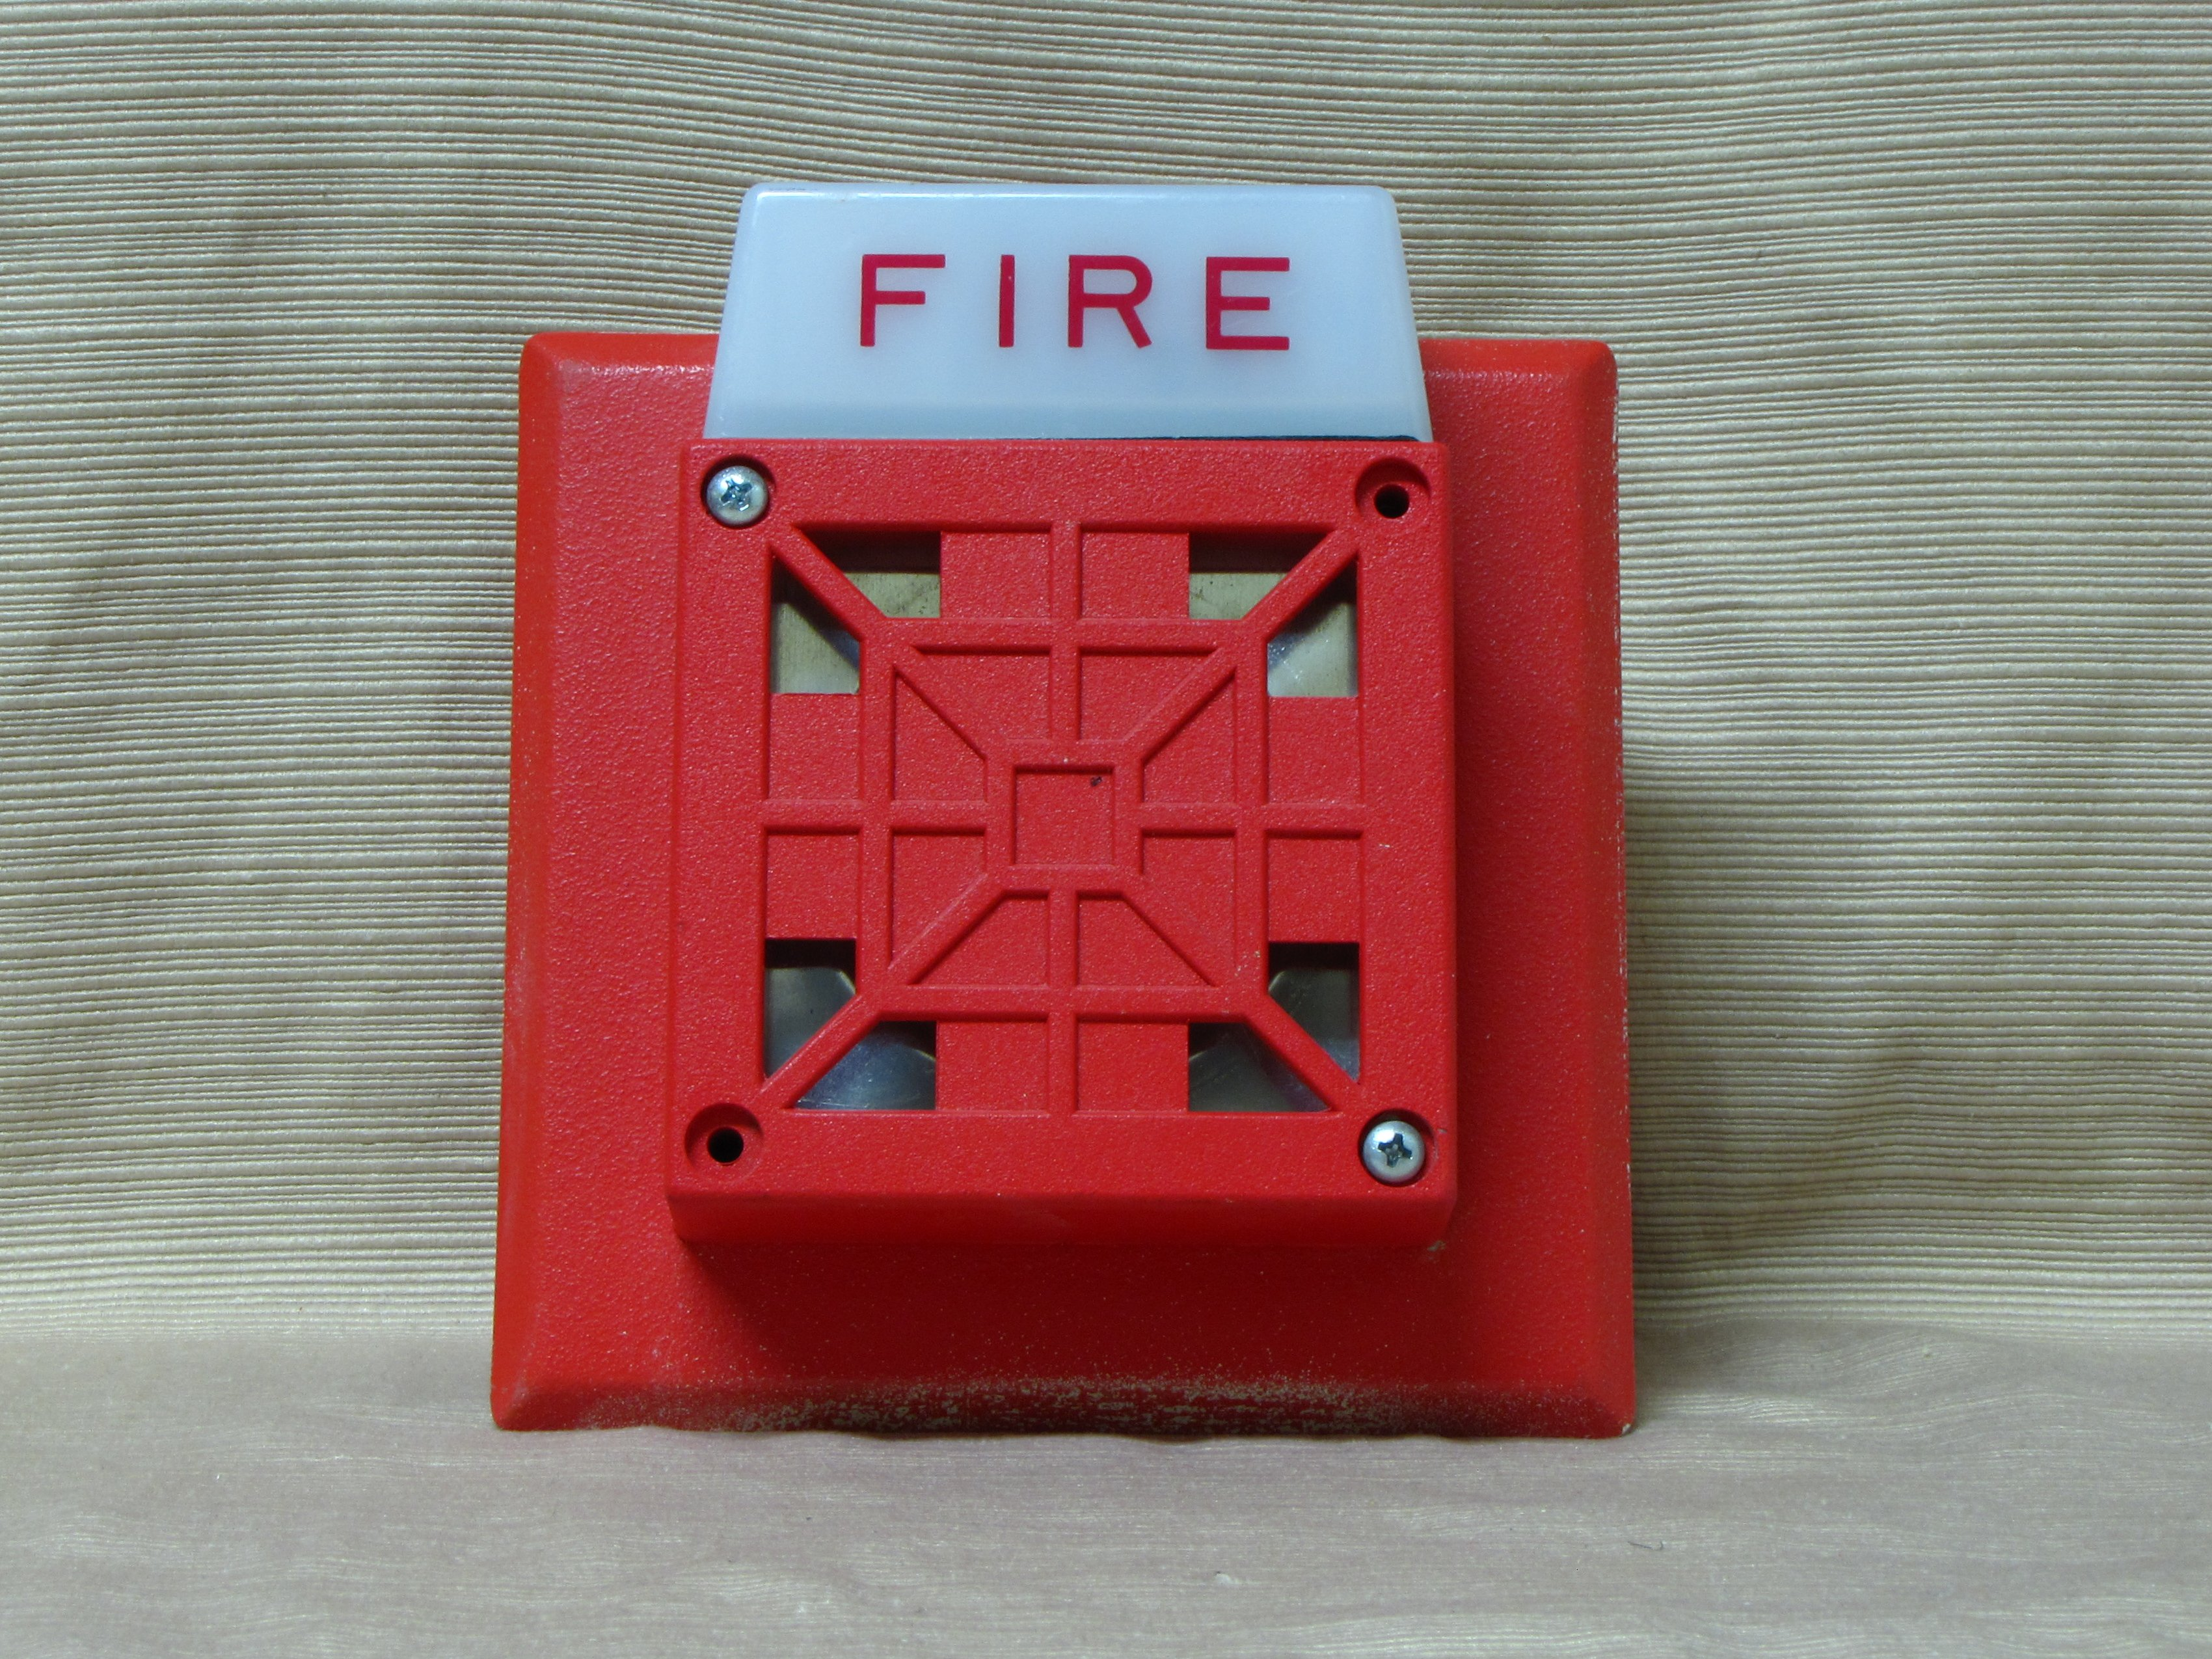 Wheelock AS-24110W Fire Alarm Horn Strobe | eBay  |Wheelock Fire Alarm Horn Strobe